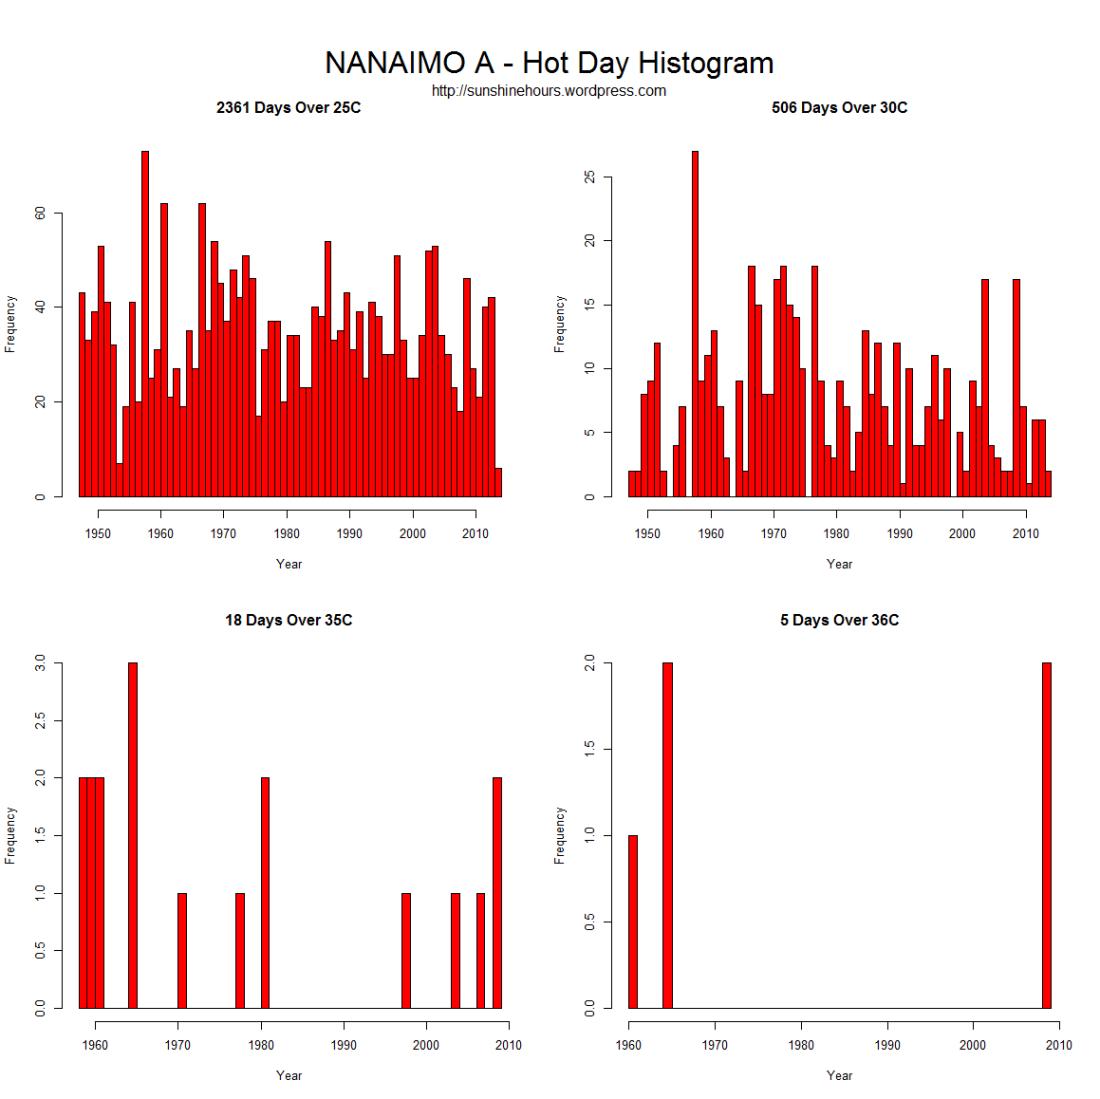 HotDay_Histogram_NANAIMO A - Hot Day Histogram